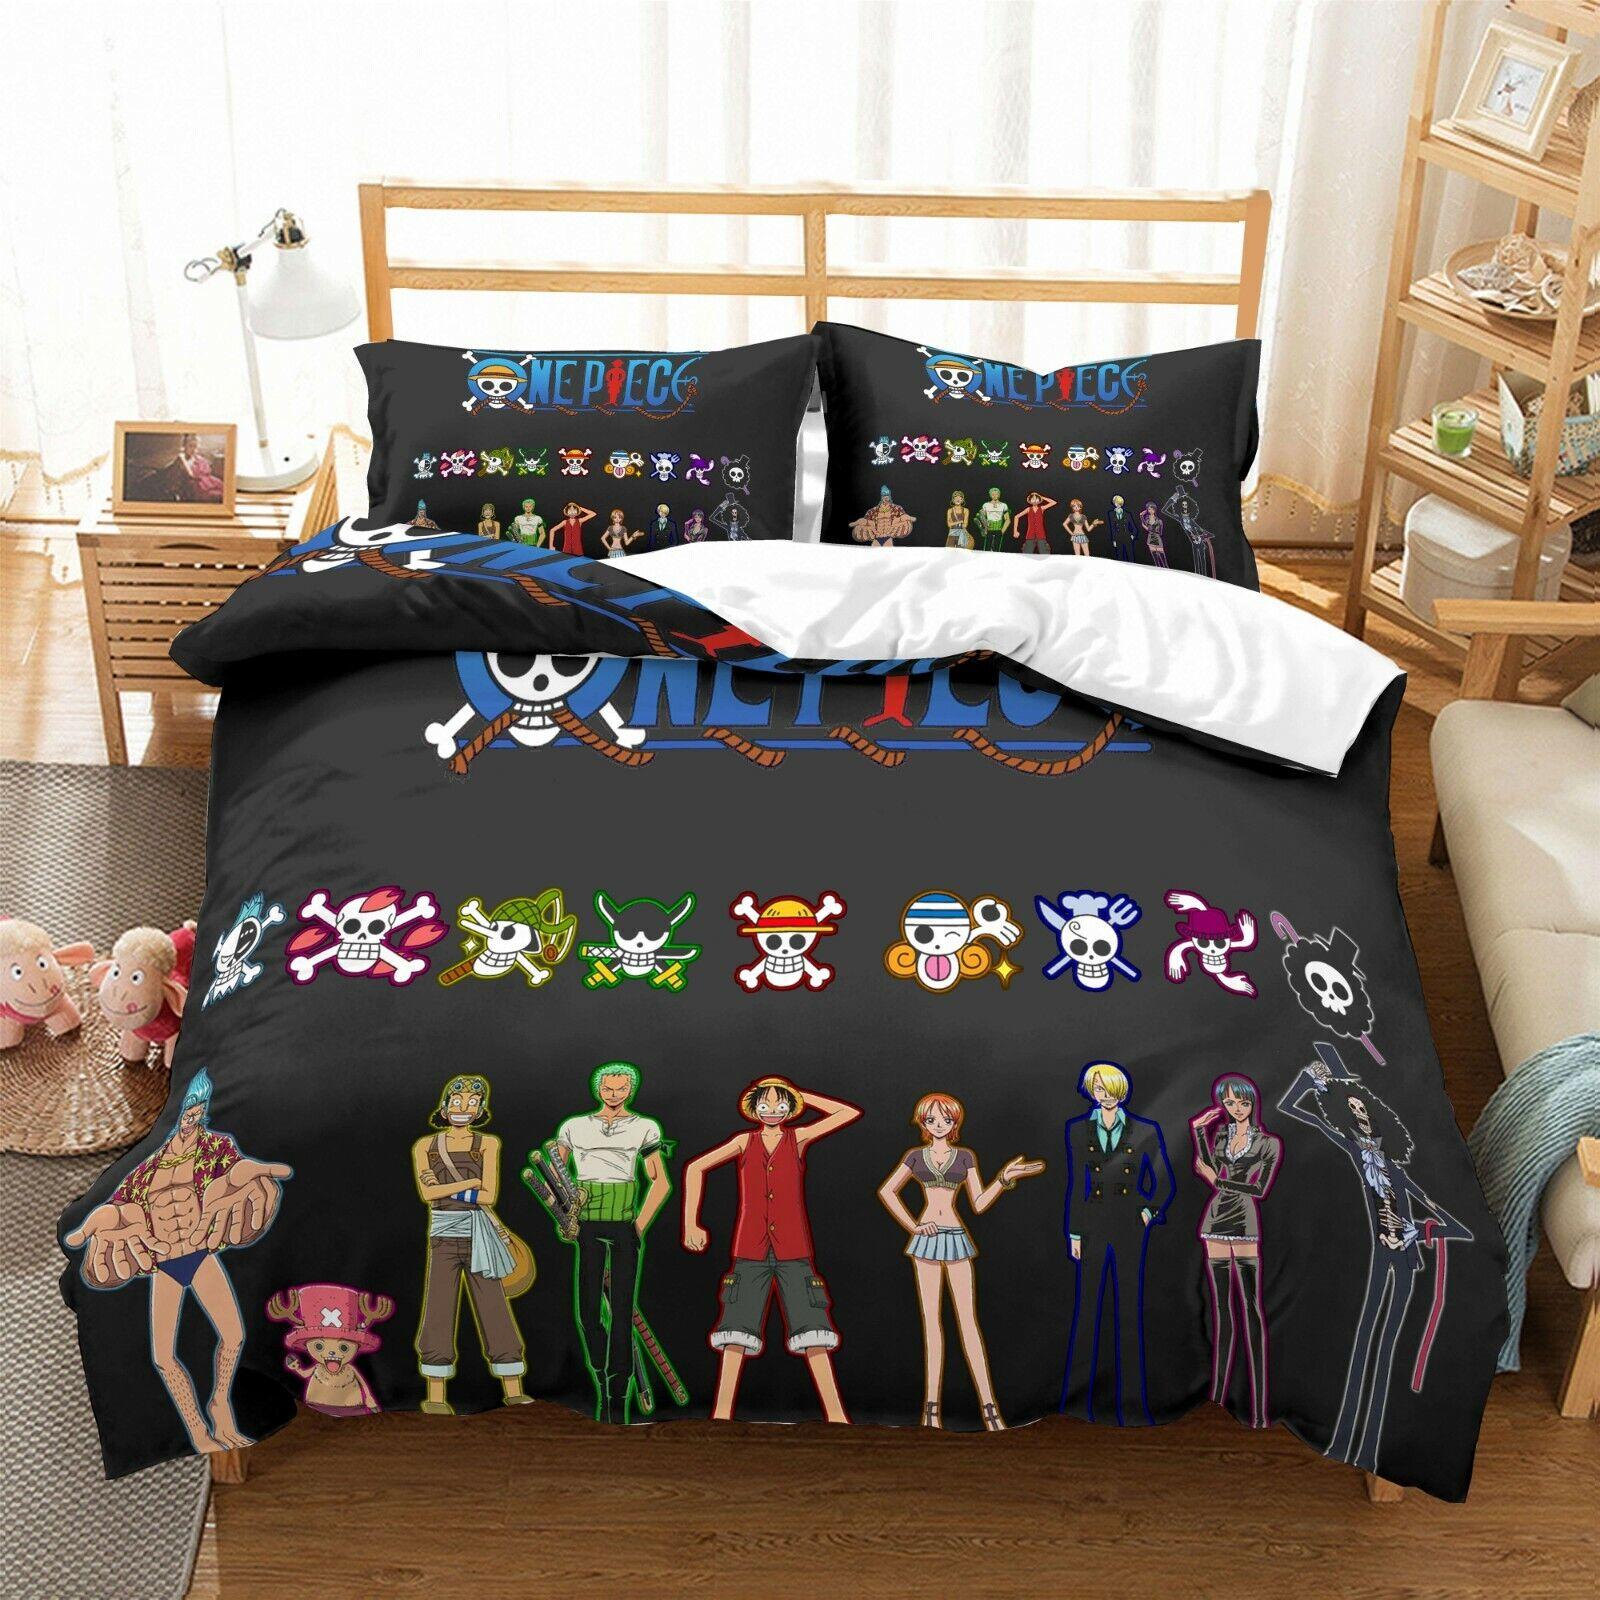 3D Japanese Pirate Quilt Cover Set Bedding Duvet Cover Double Queen King 3pcs 47